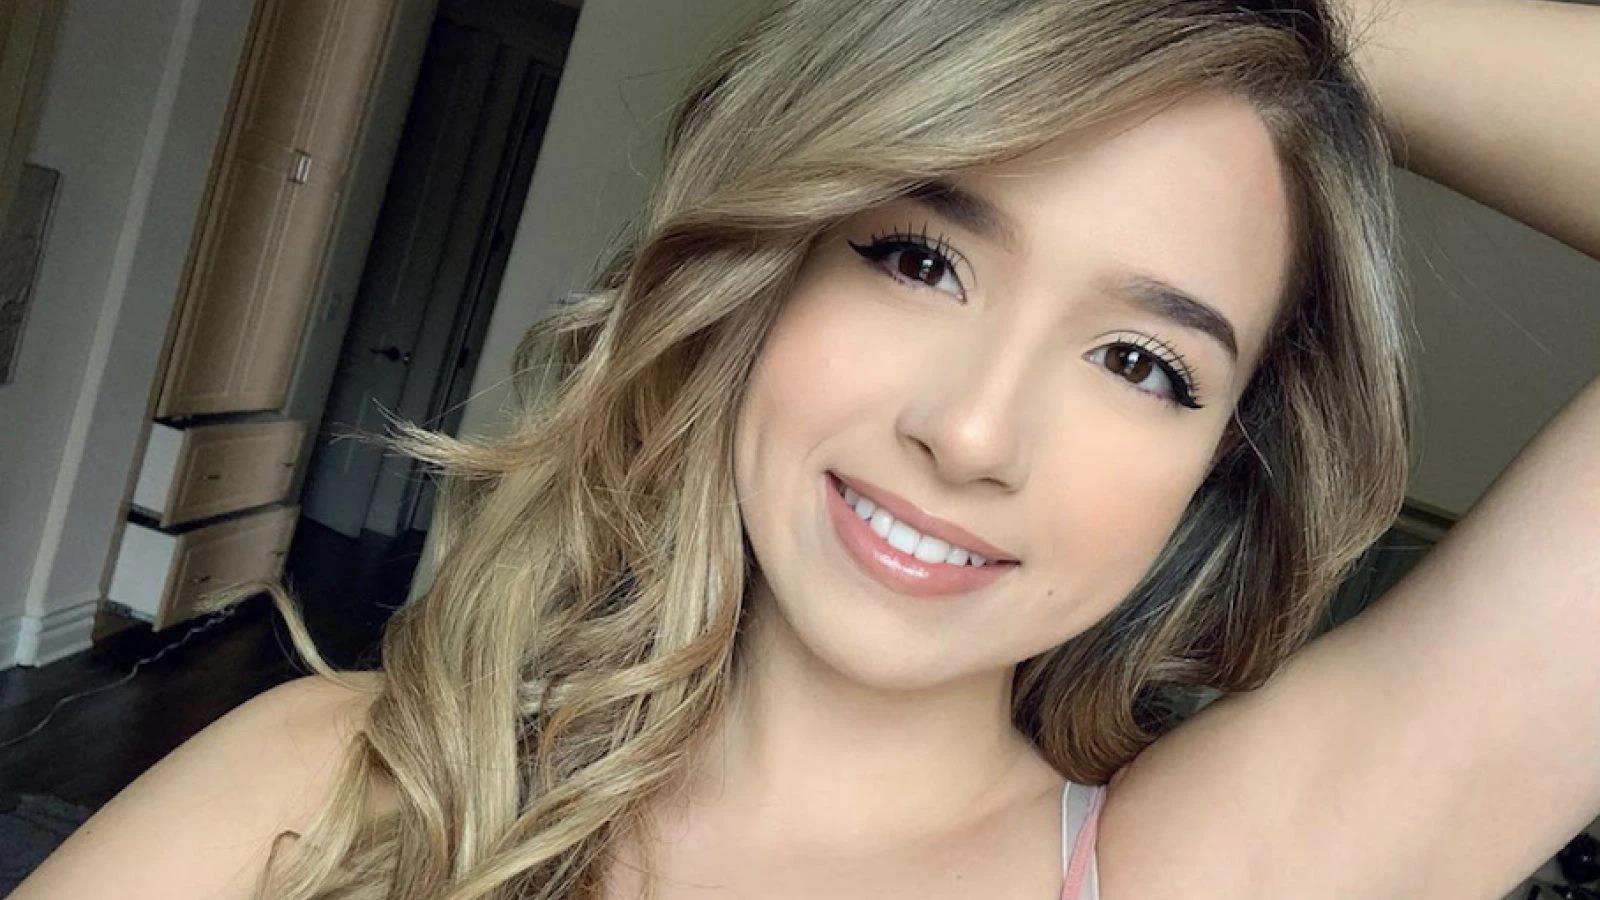 Pokimane | Streamer nữ nổi tiếng số một của Twitch - M21LOVE